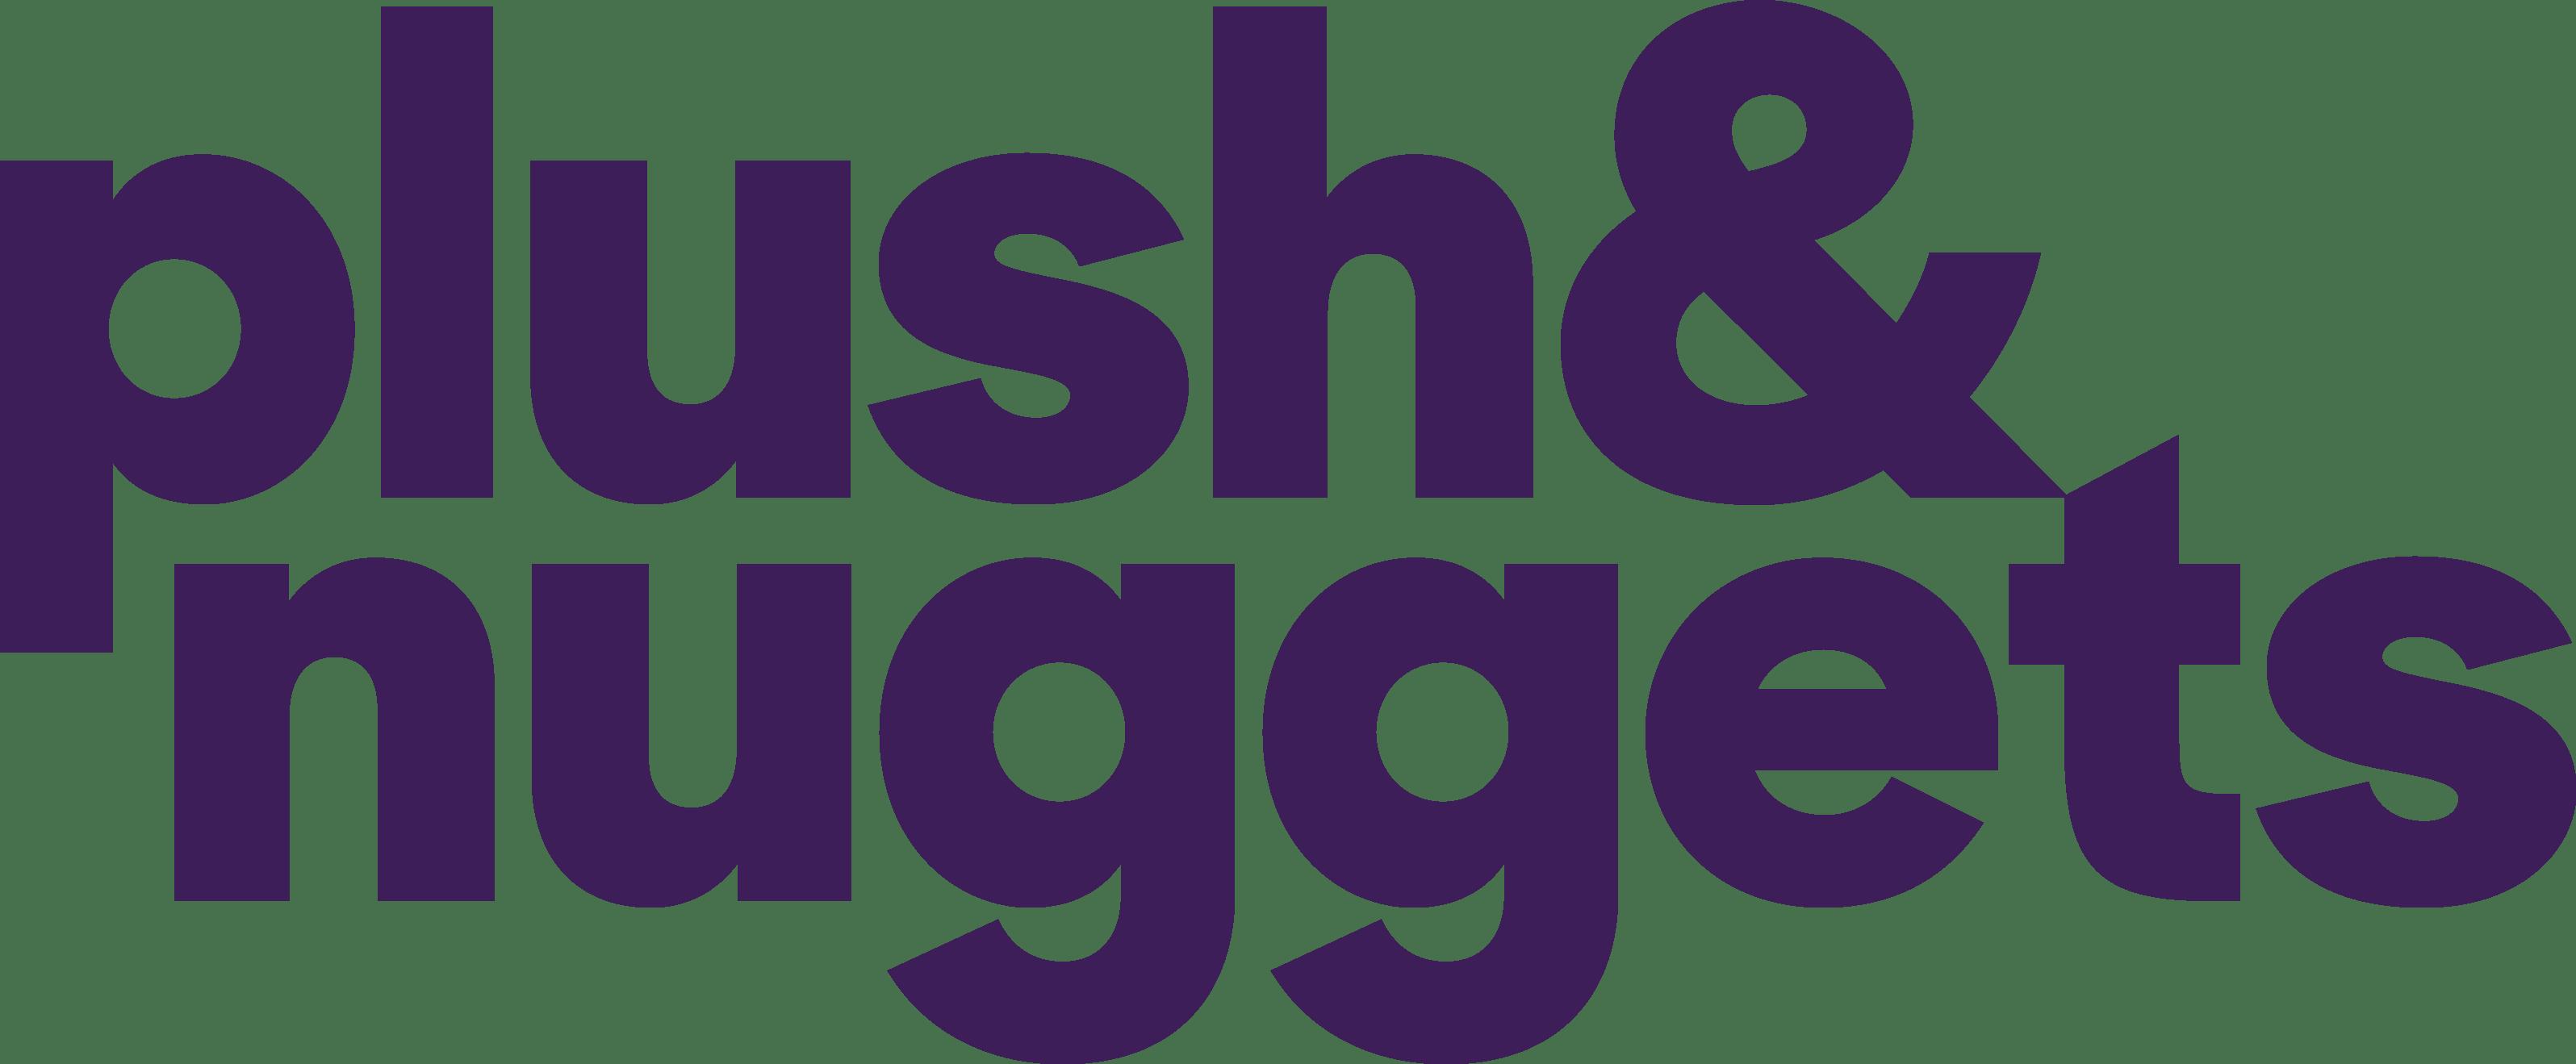 Plush & Nuggets